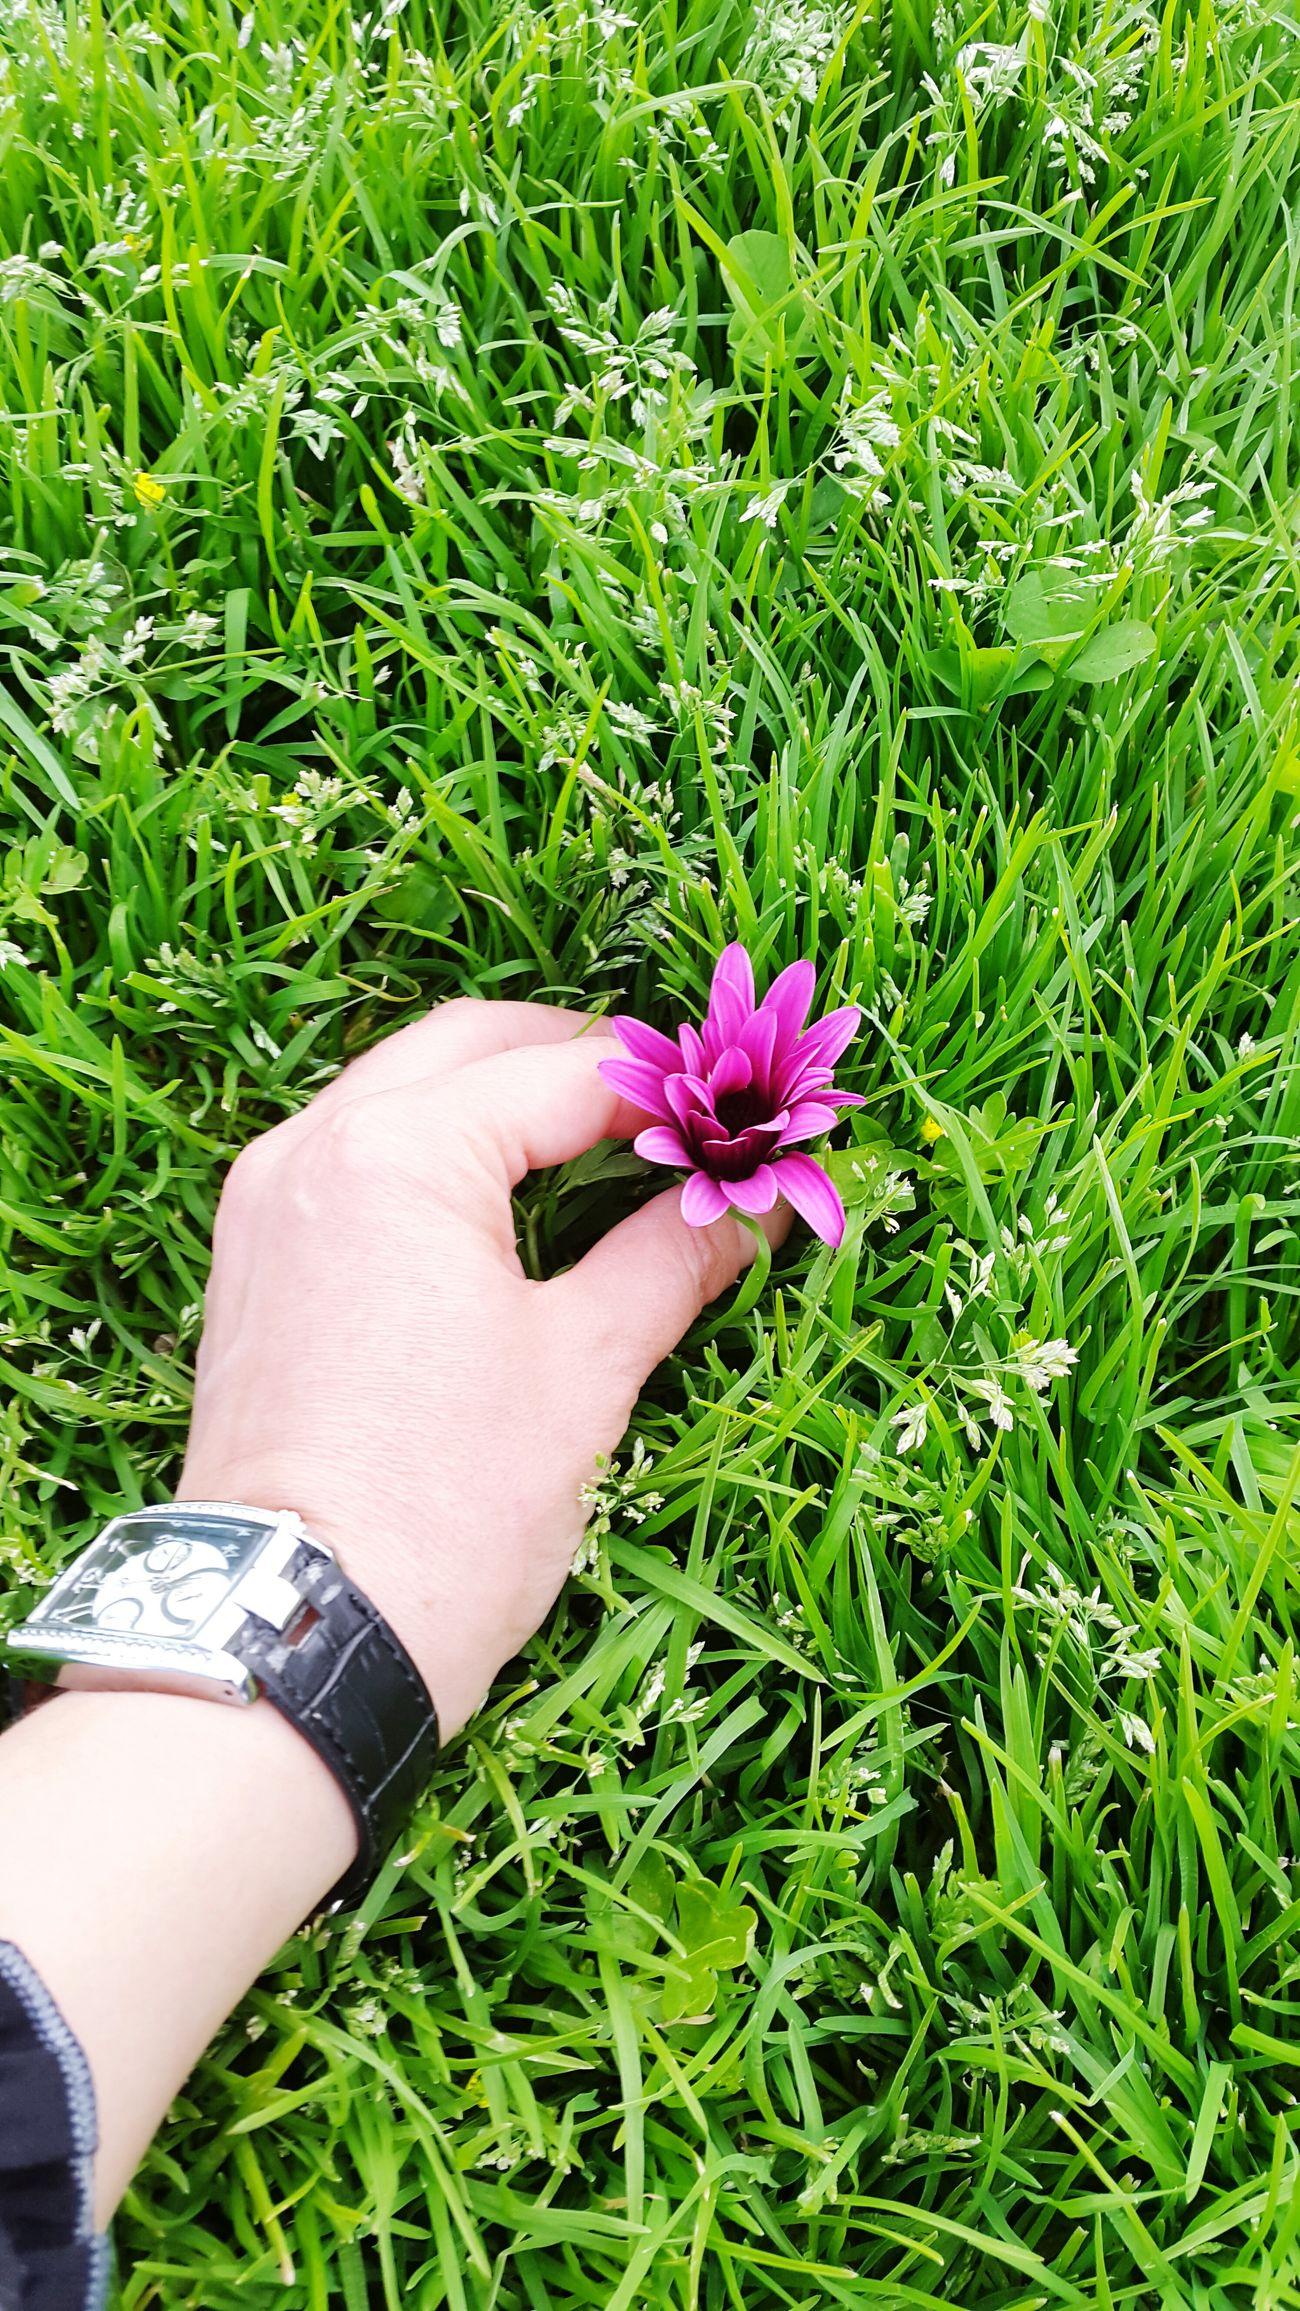 Antalya Iloveturkey EyeEm Best Shots - Flowers ı Love Nature! Holiday♡ AlwaysSmile